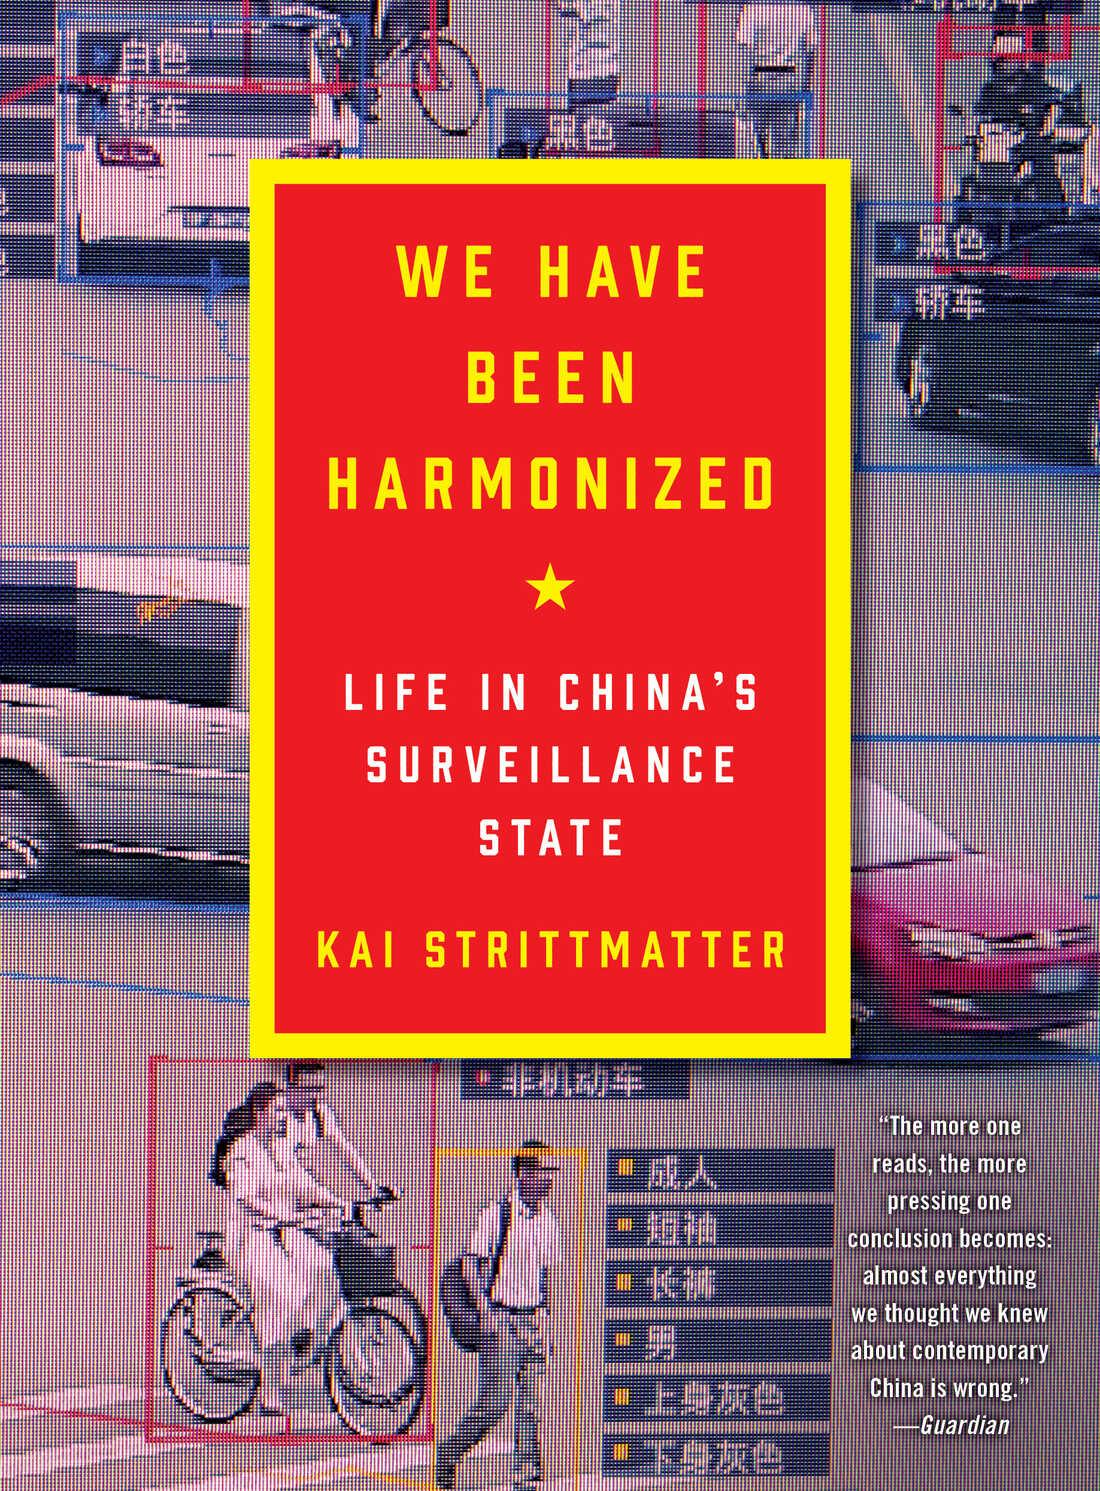 We Have Been Harmonized by Kai Strittmatter